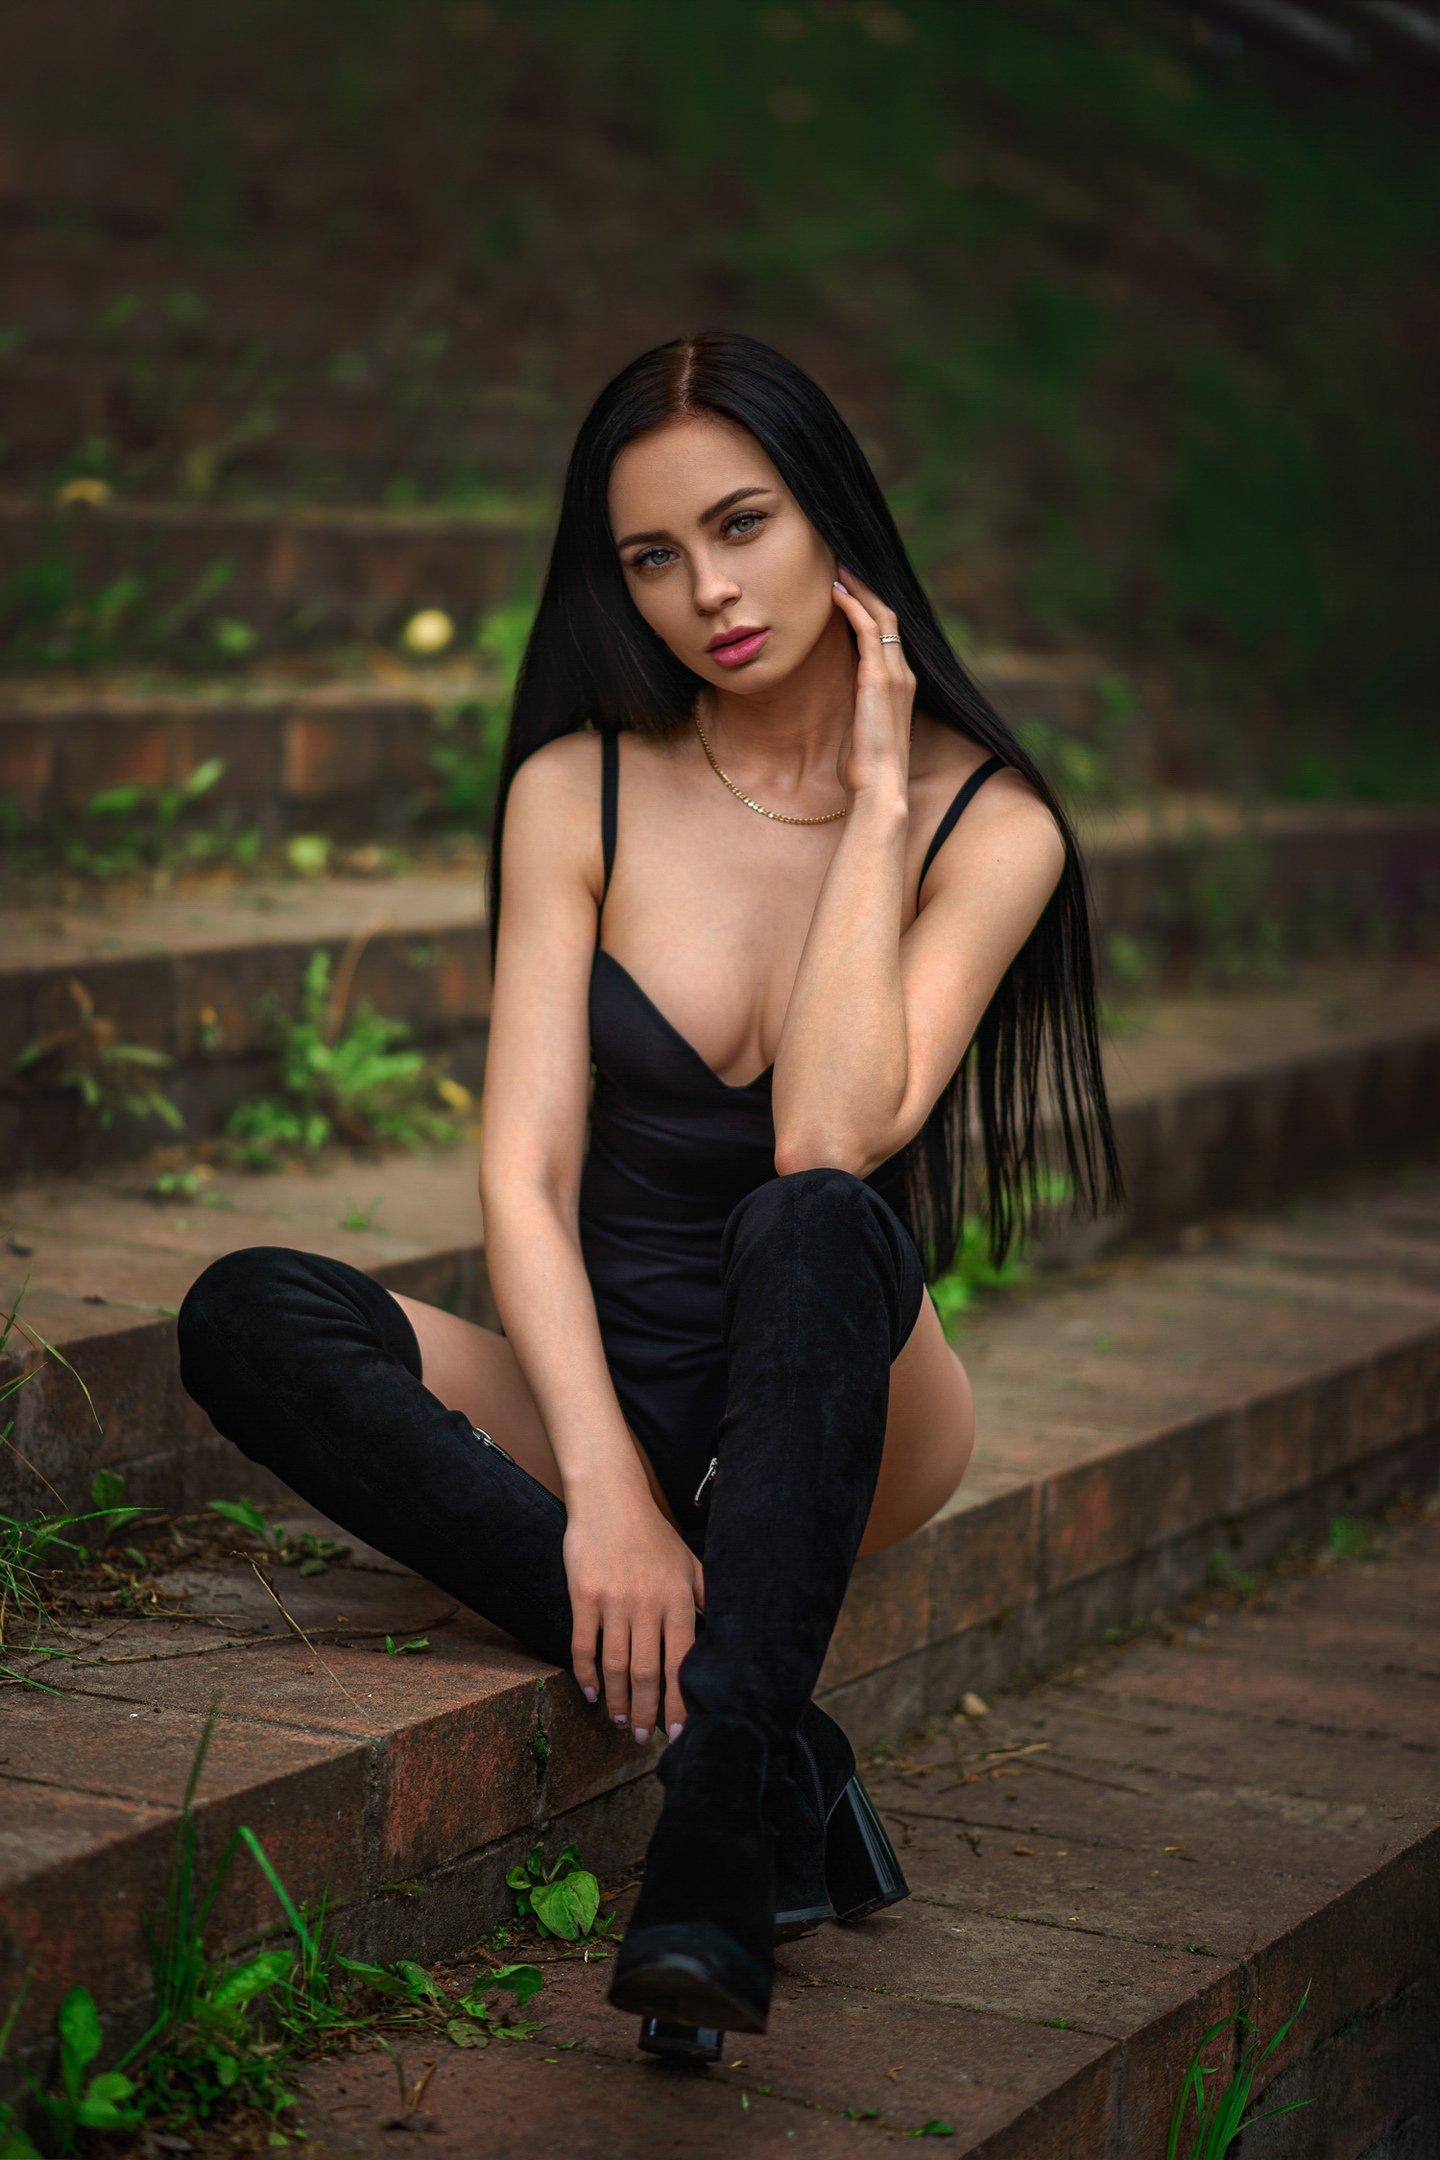 girl sexy nude dmitrymedved black white  lingerie, Медведь Дмитрий